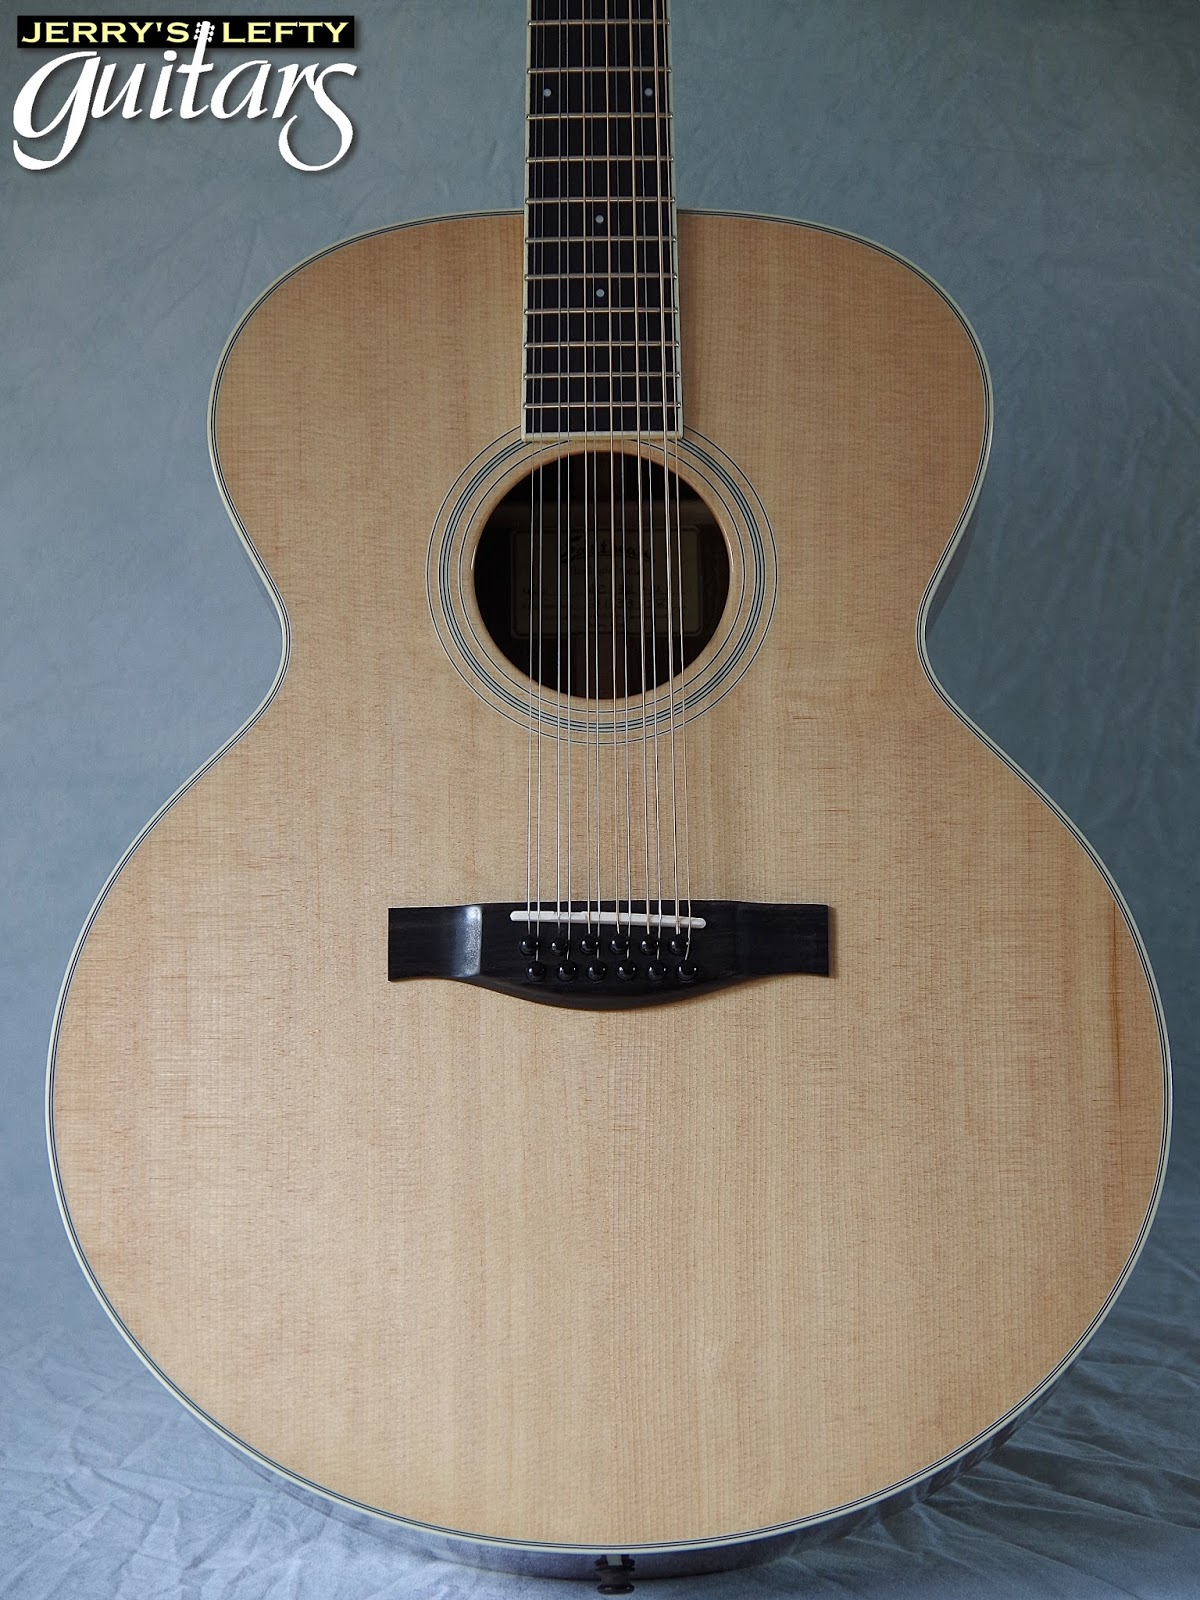 jerry 39 s lefty guitars newest guitar arrivals updated weekly eastman ac330 12 string left. Black Bedroom Furniture Sets. Home Design Ideas